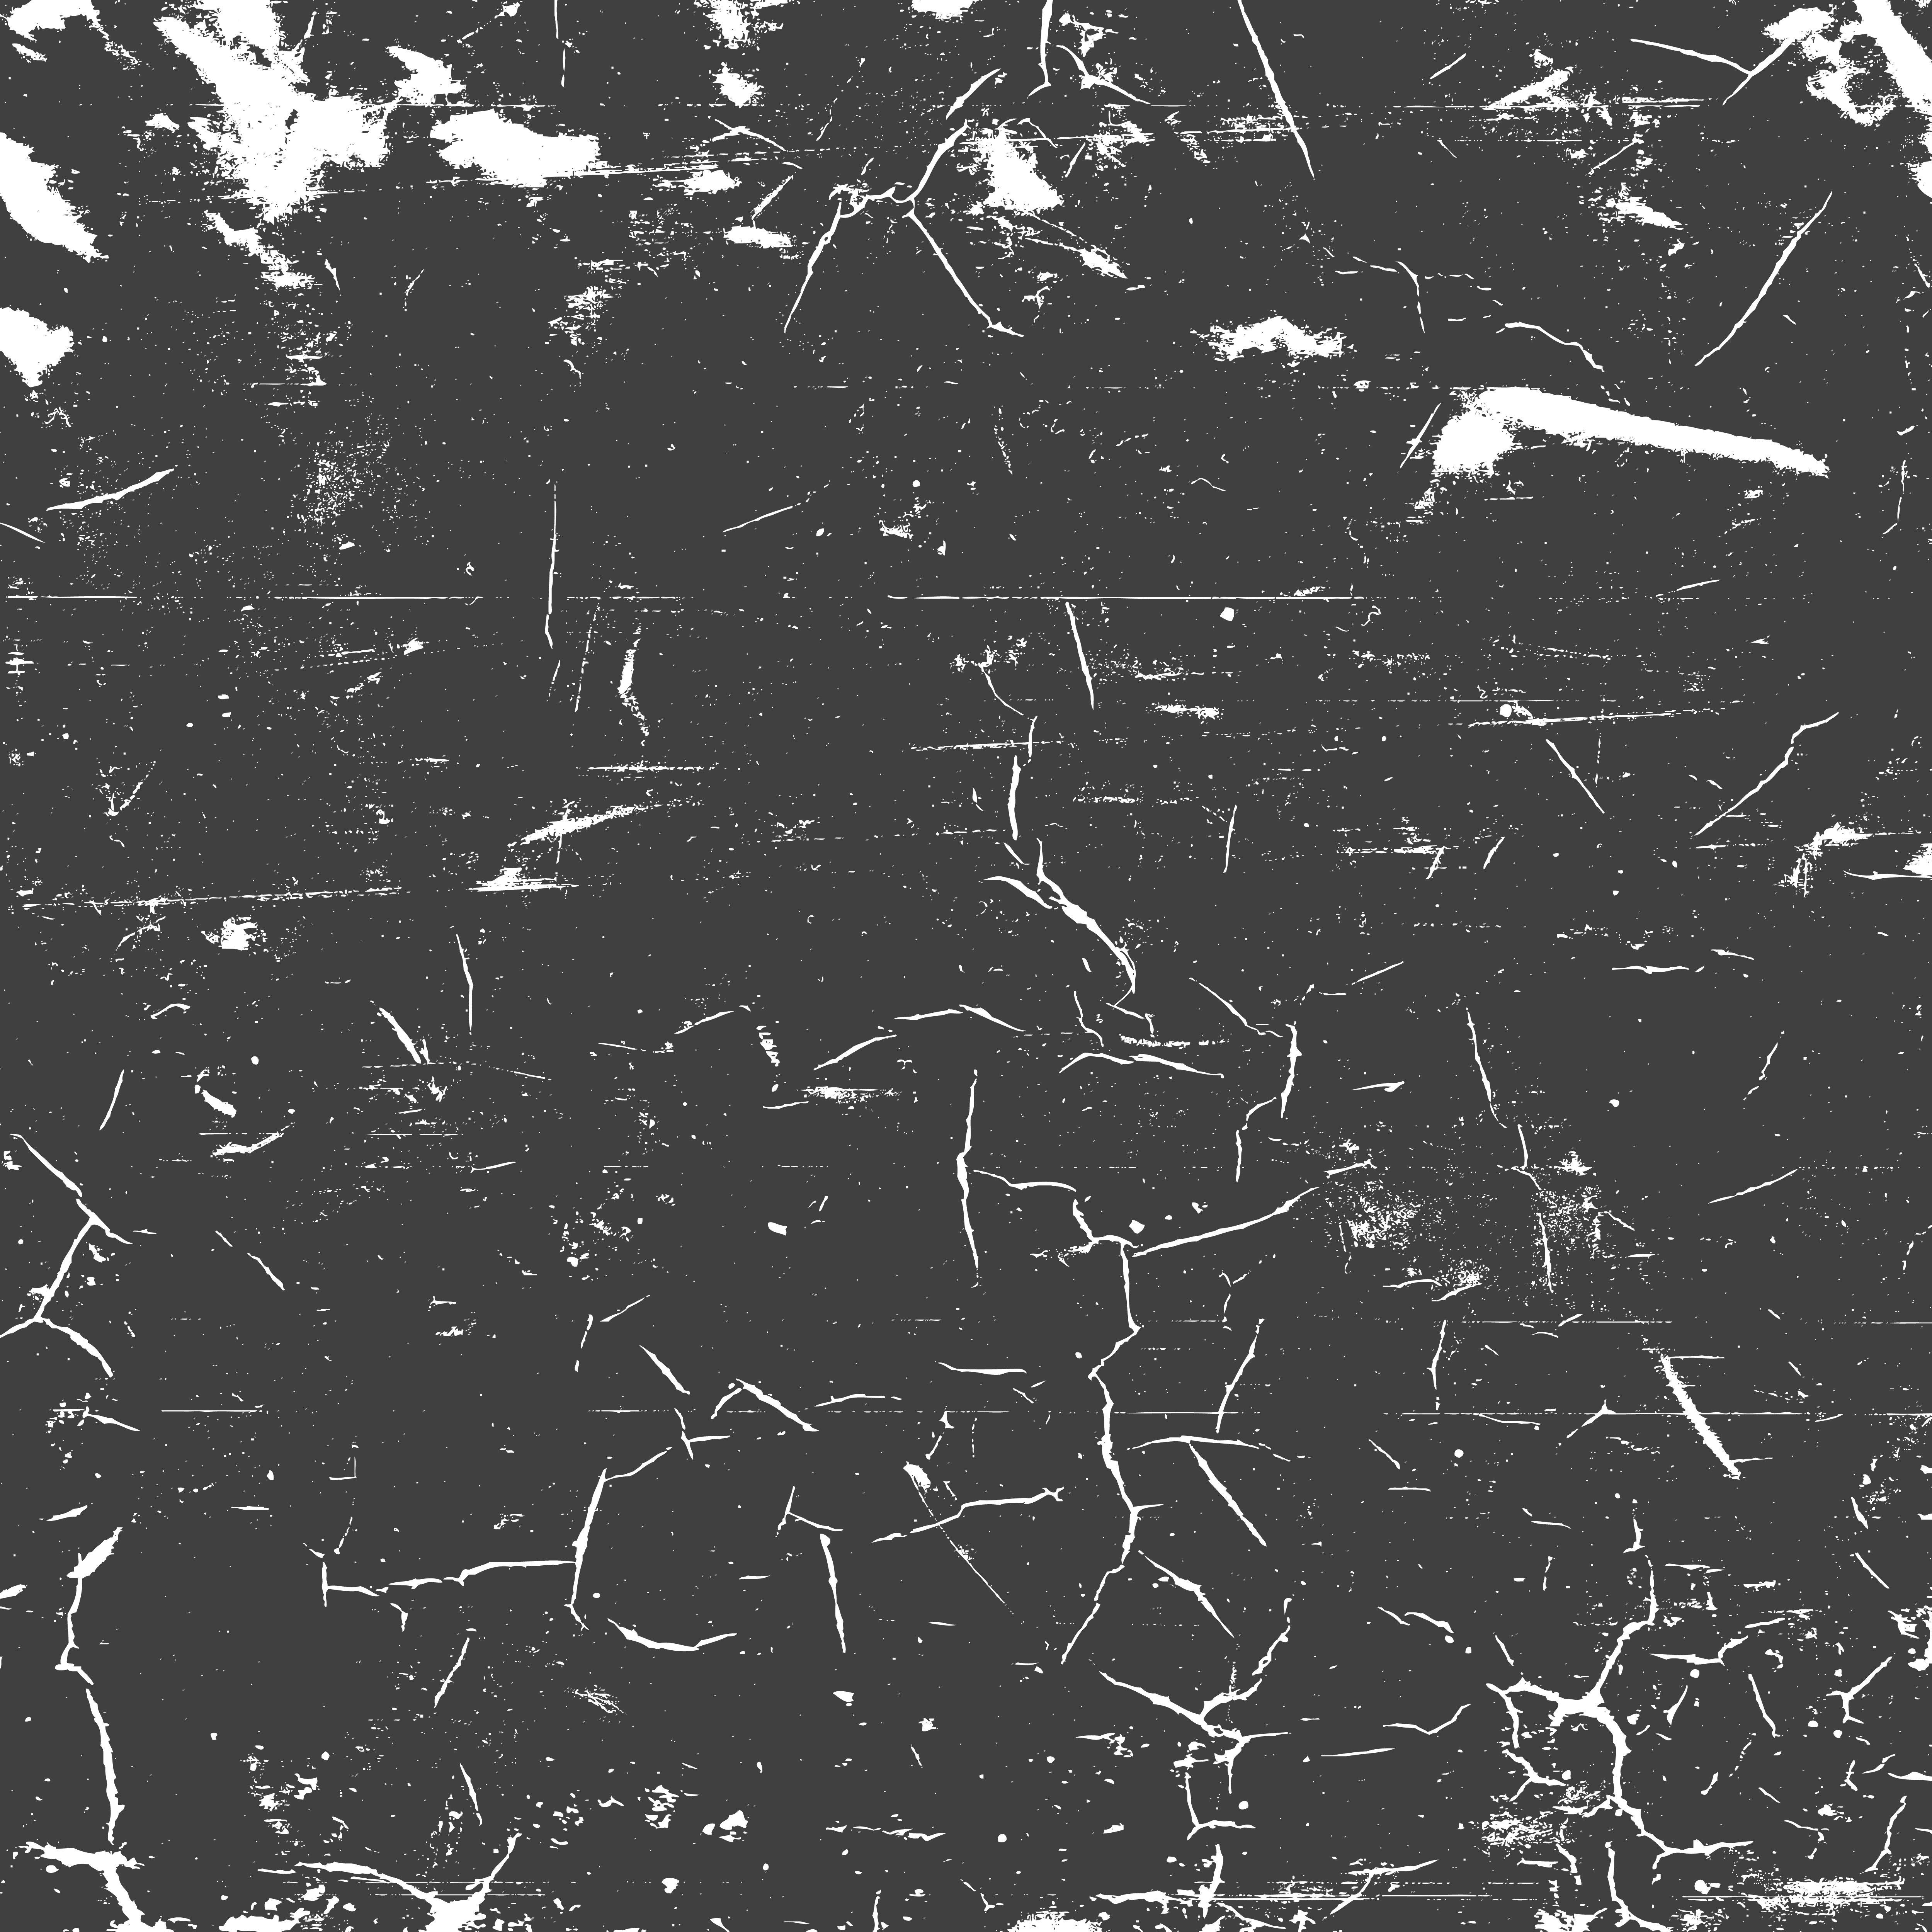 Grunge texture overlay background 1307911 Vector Art at Vecteezy 5000x5000